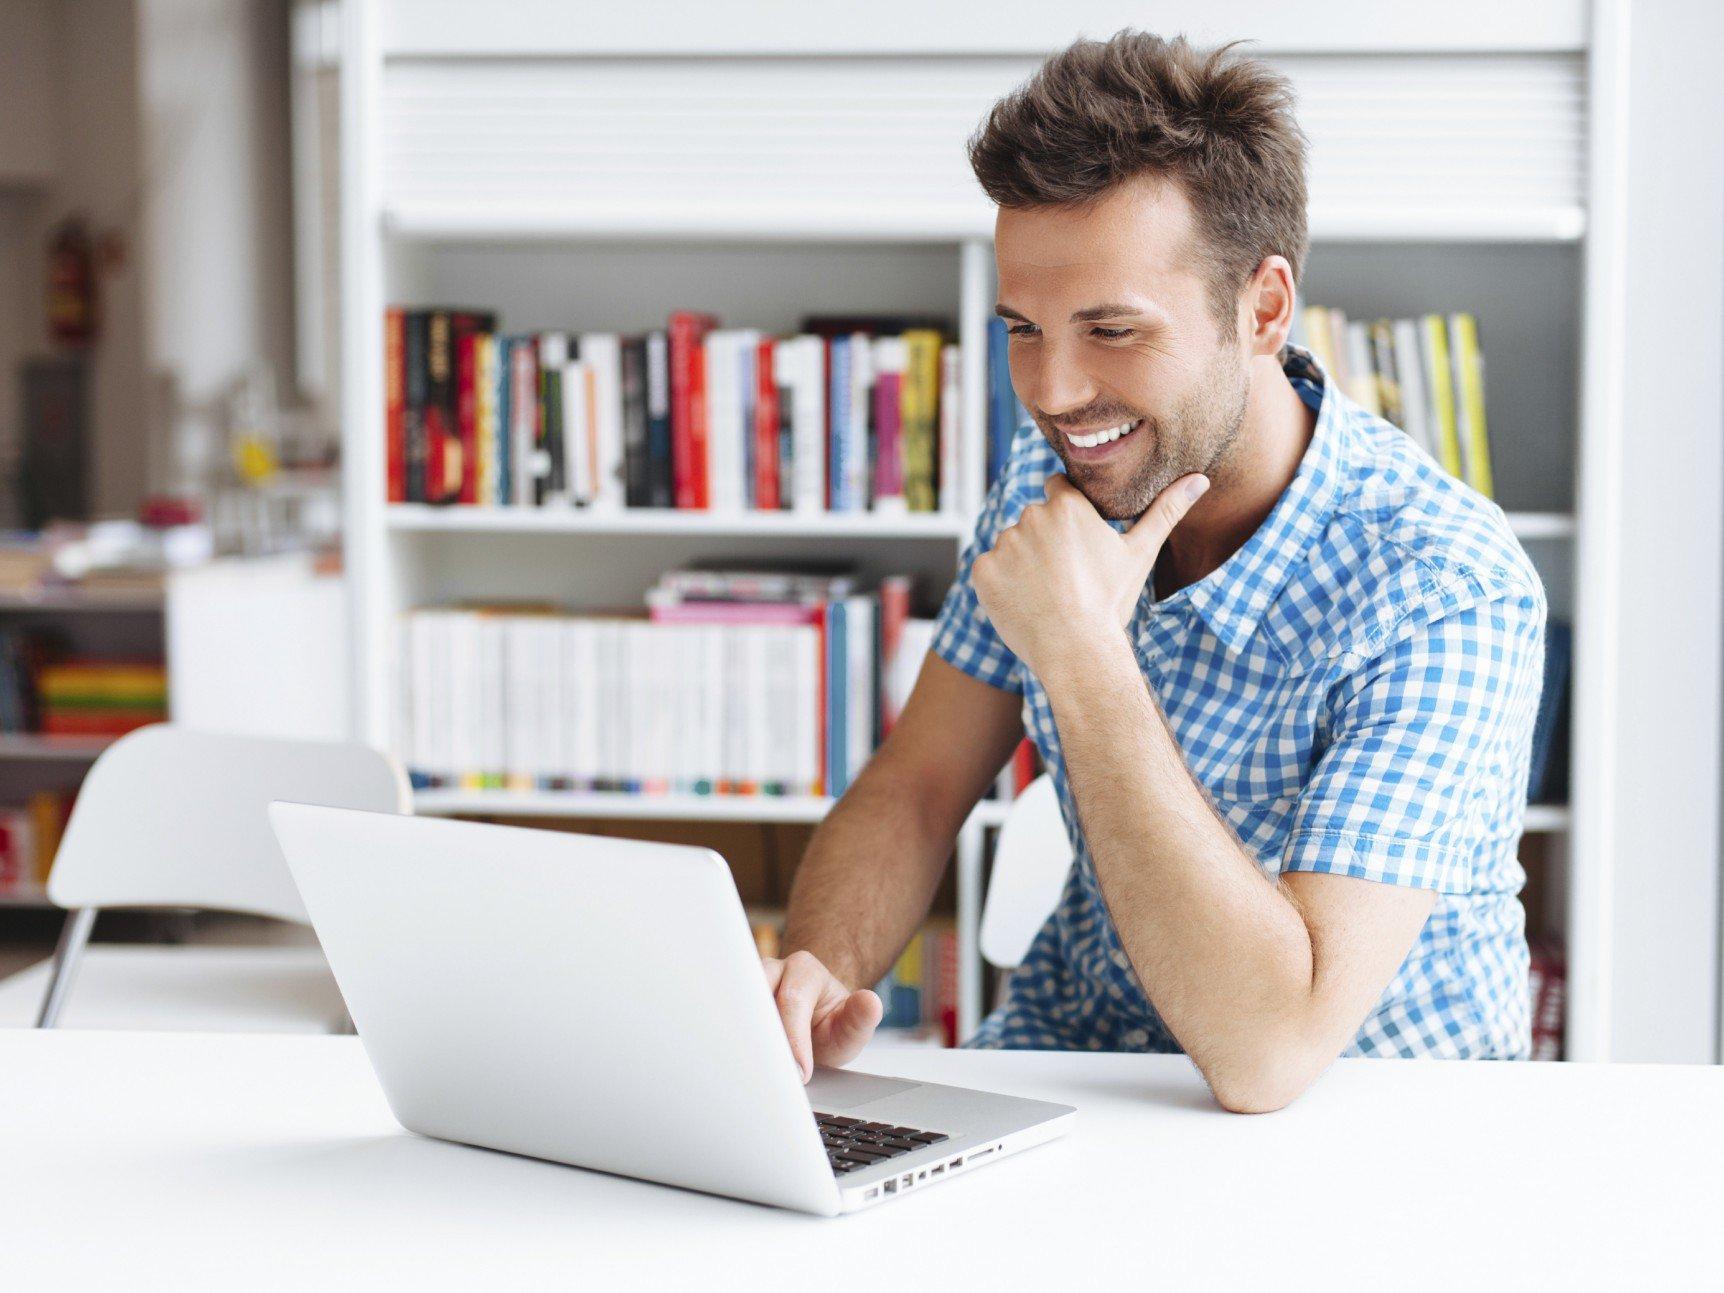 Freelance it consulting удаленная работа мама дома